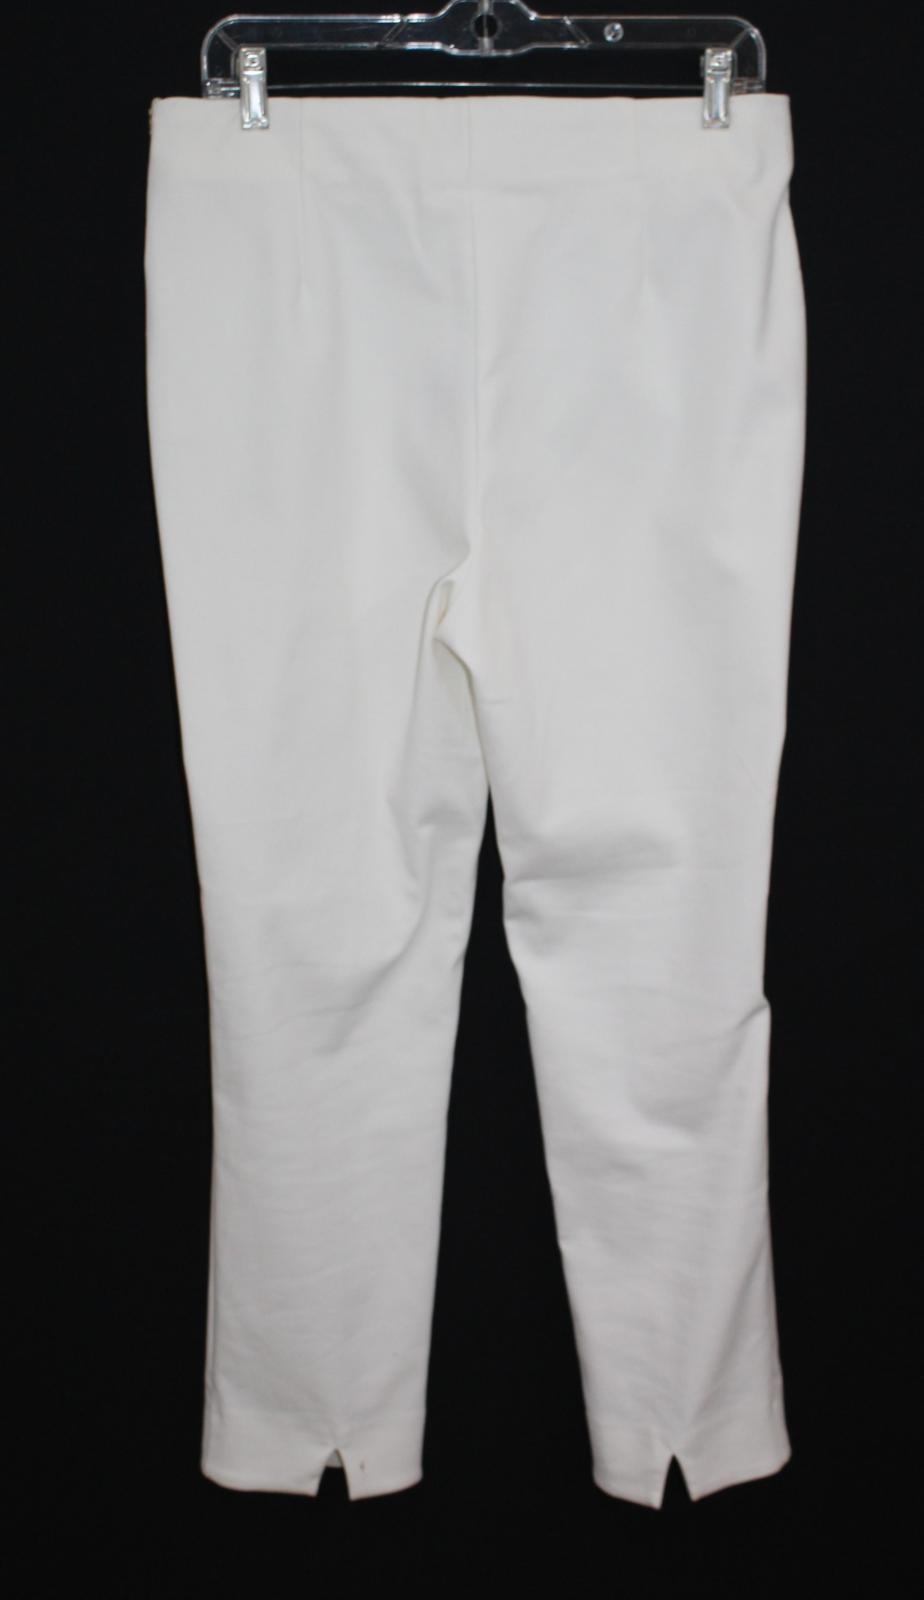 Costa-Damas-Marfil-Alexa-Algodon-Mezcla-recortada-High-rise-Pantalones-Cremallera-Lateral-UK14 miniatura 2